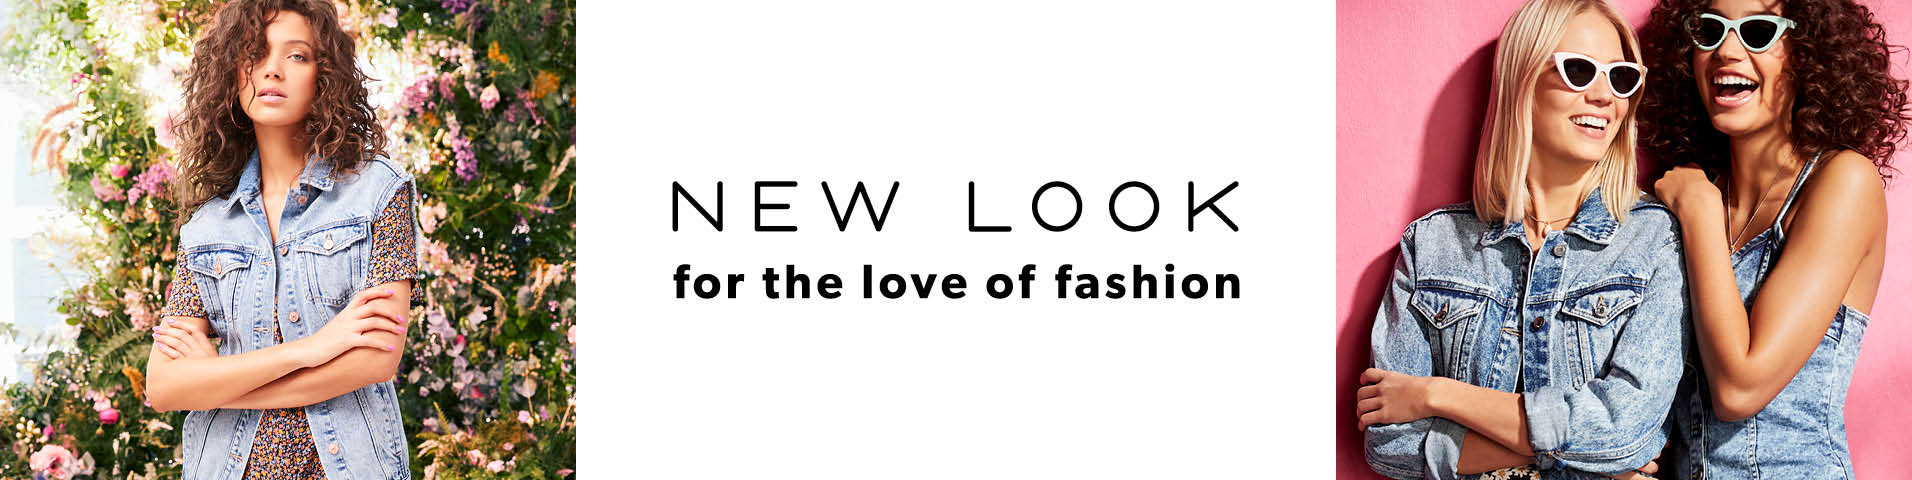 c976865f4 Sneakers femme New Look | Achetez en ligne sur Zalando